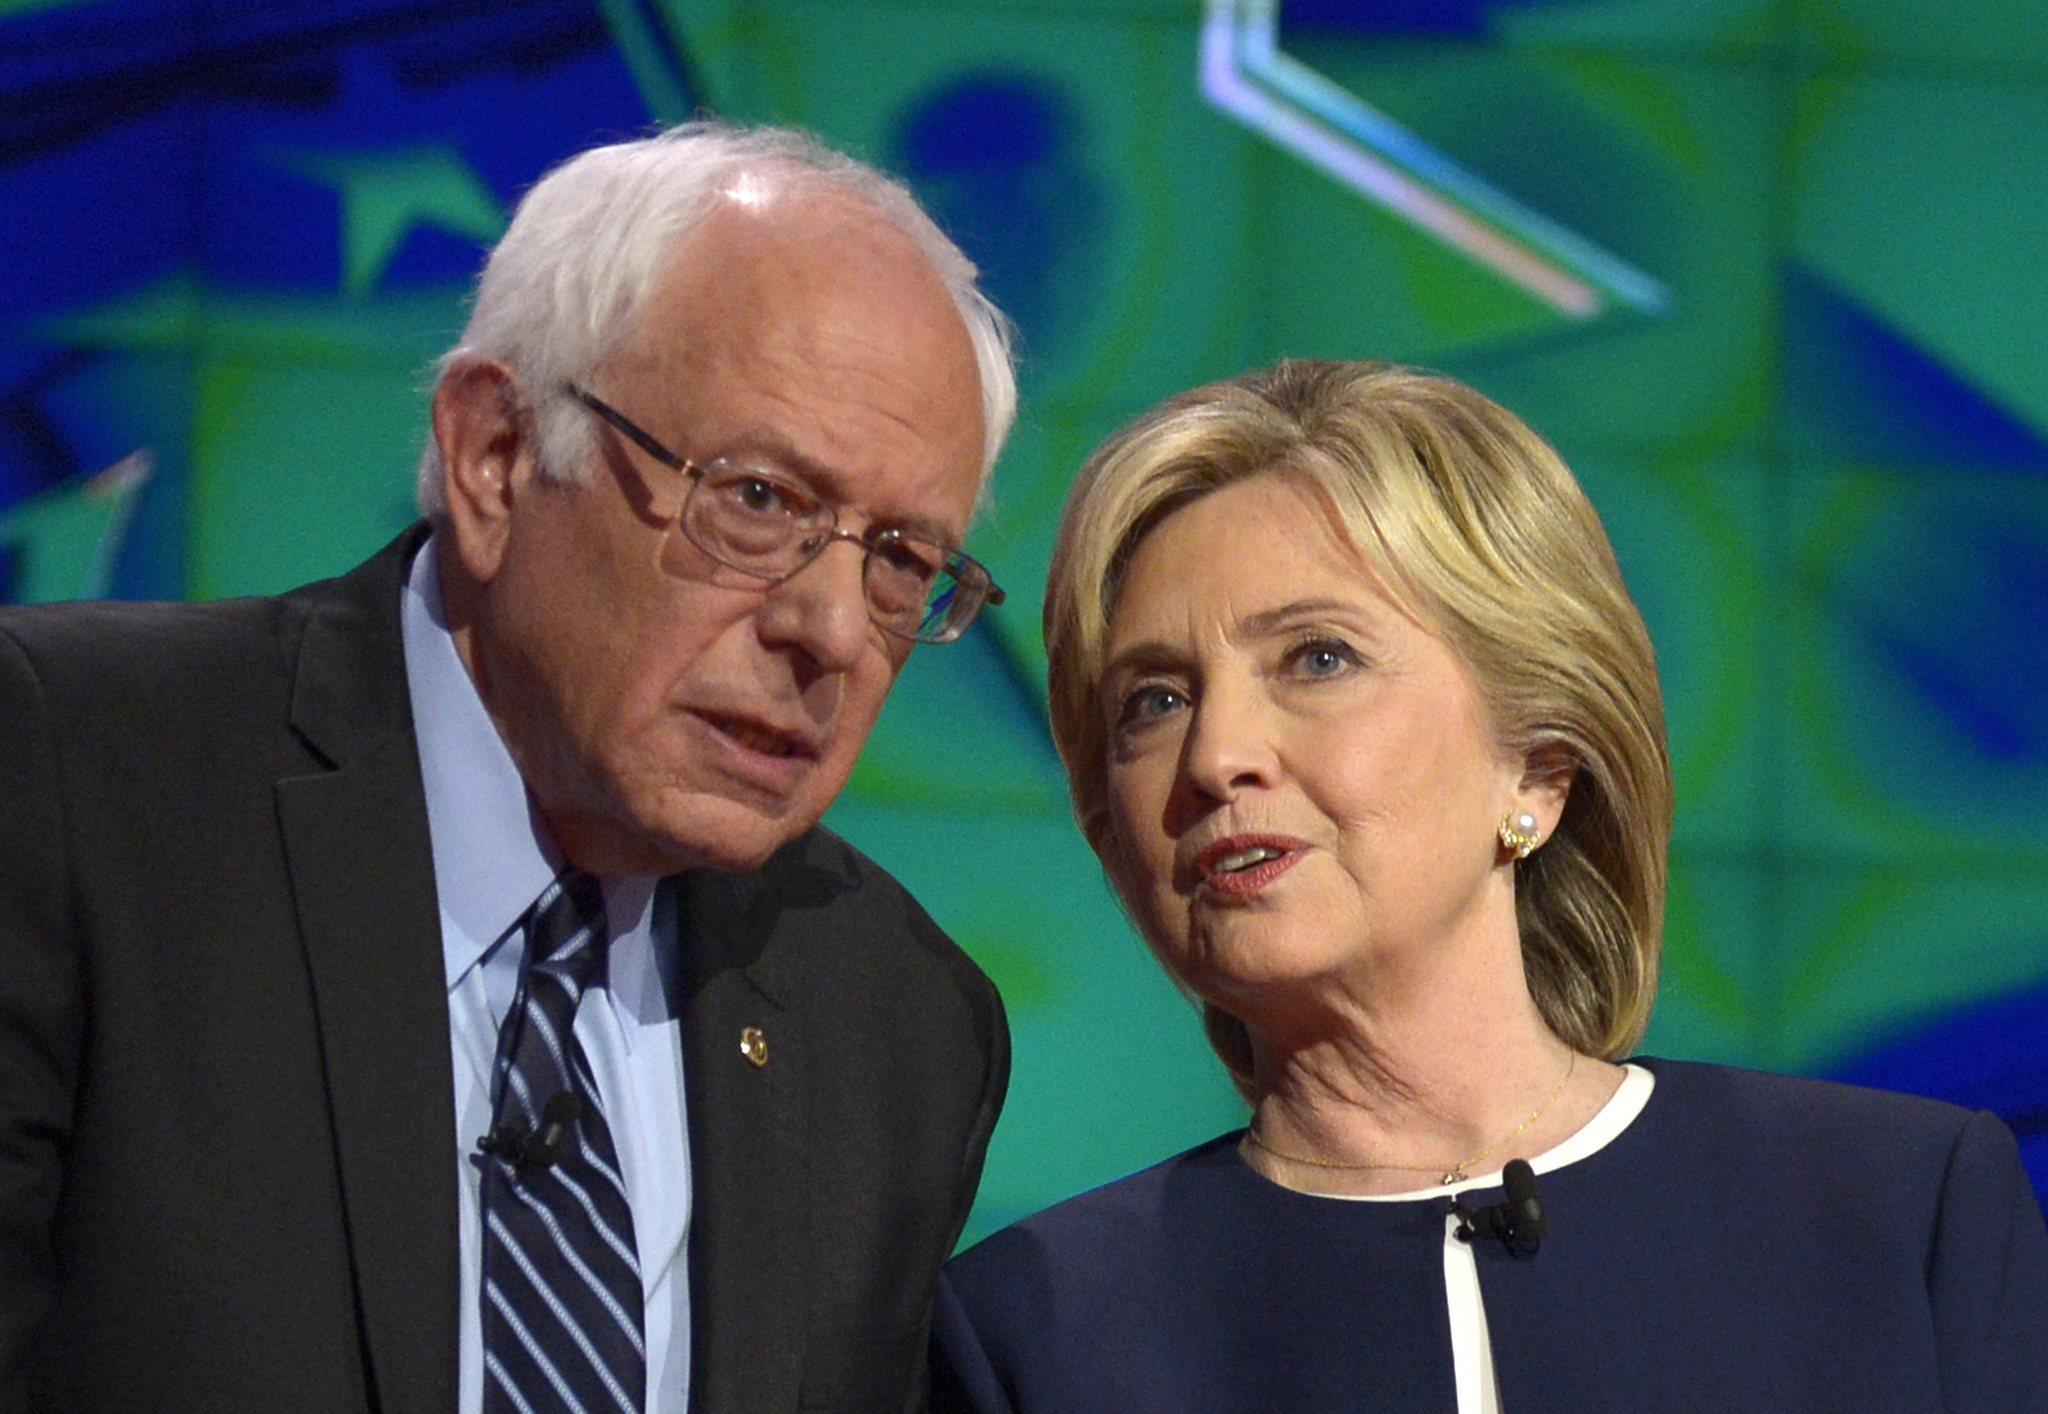 Sen. Bernie Sanders (I-Vt.) and former Secretary of State Hillary Rodham Clinton talk before the start of the Democratic presidential debate in Las Vegas last month. (Mike Nelson / EPA)